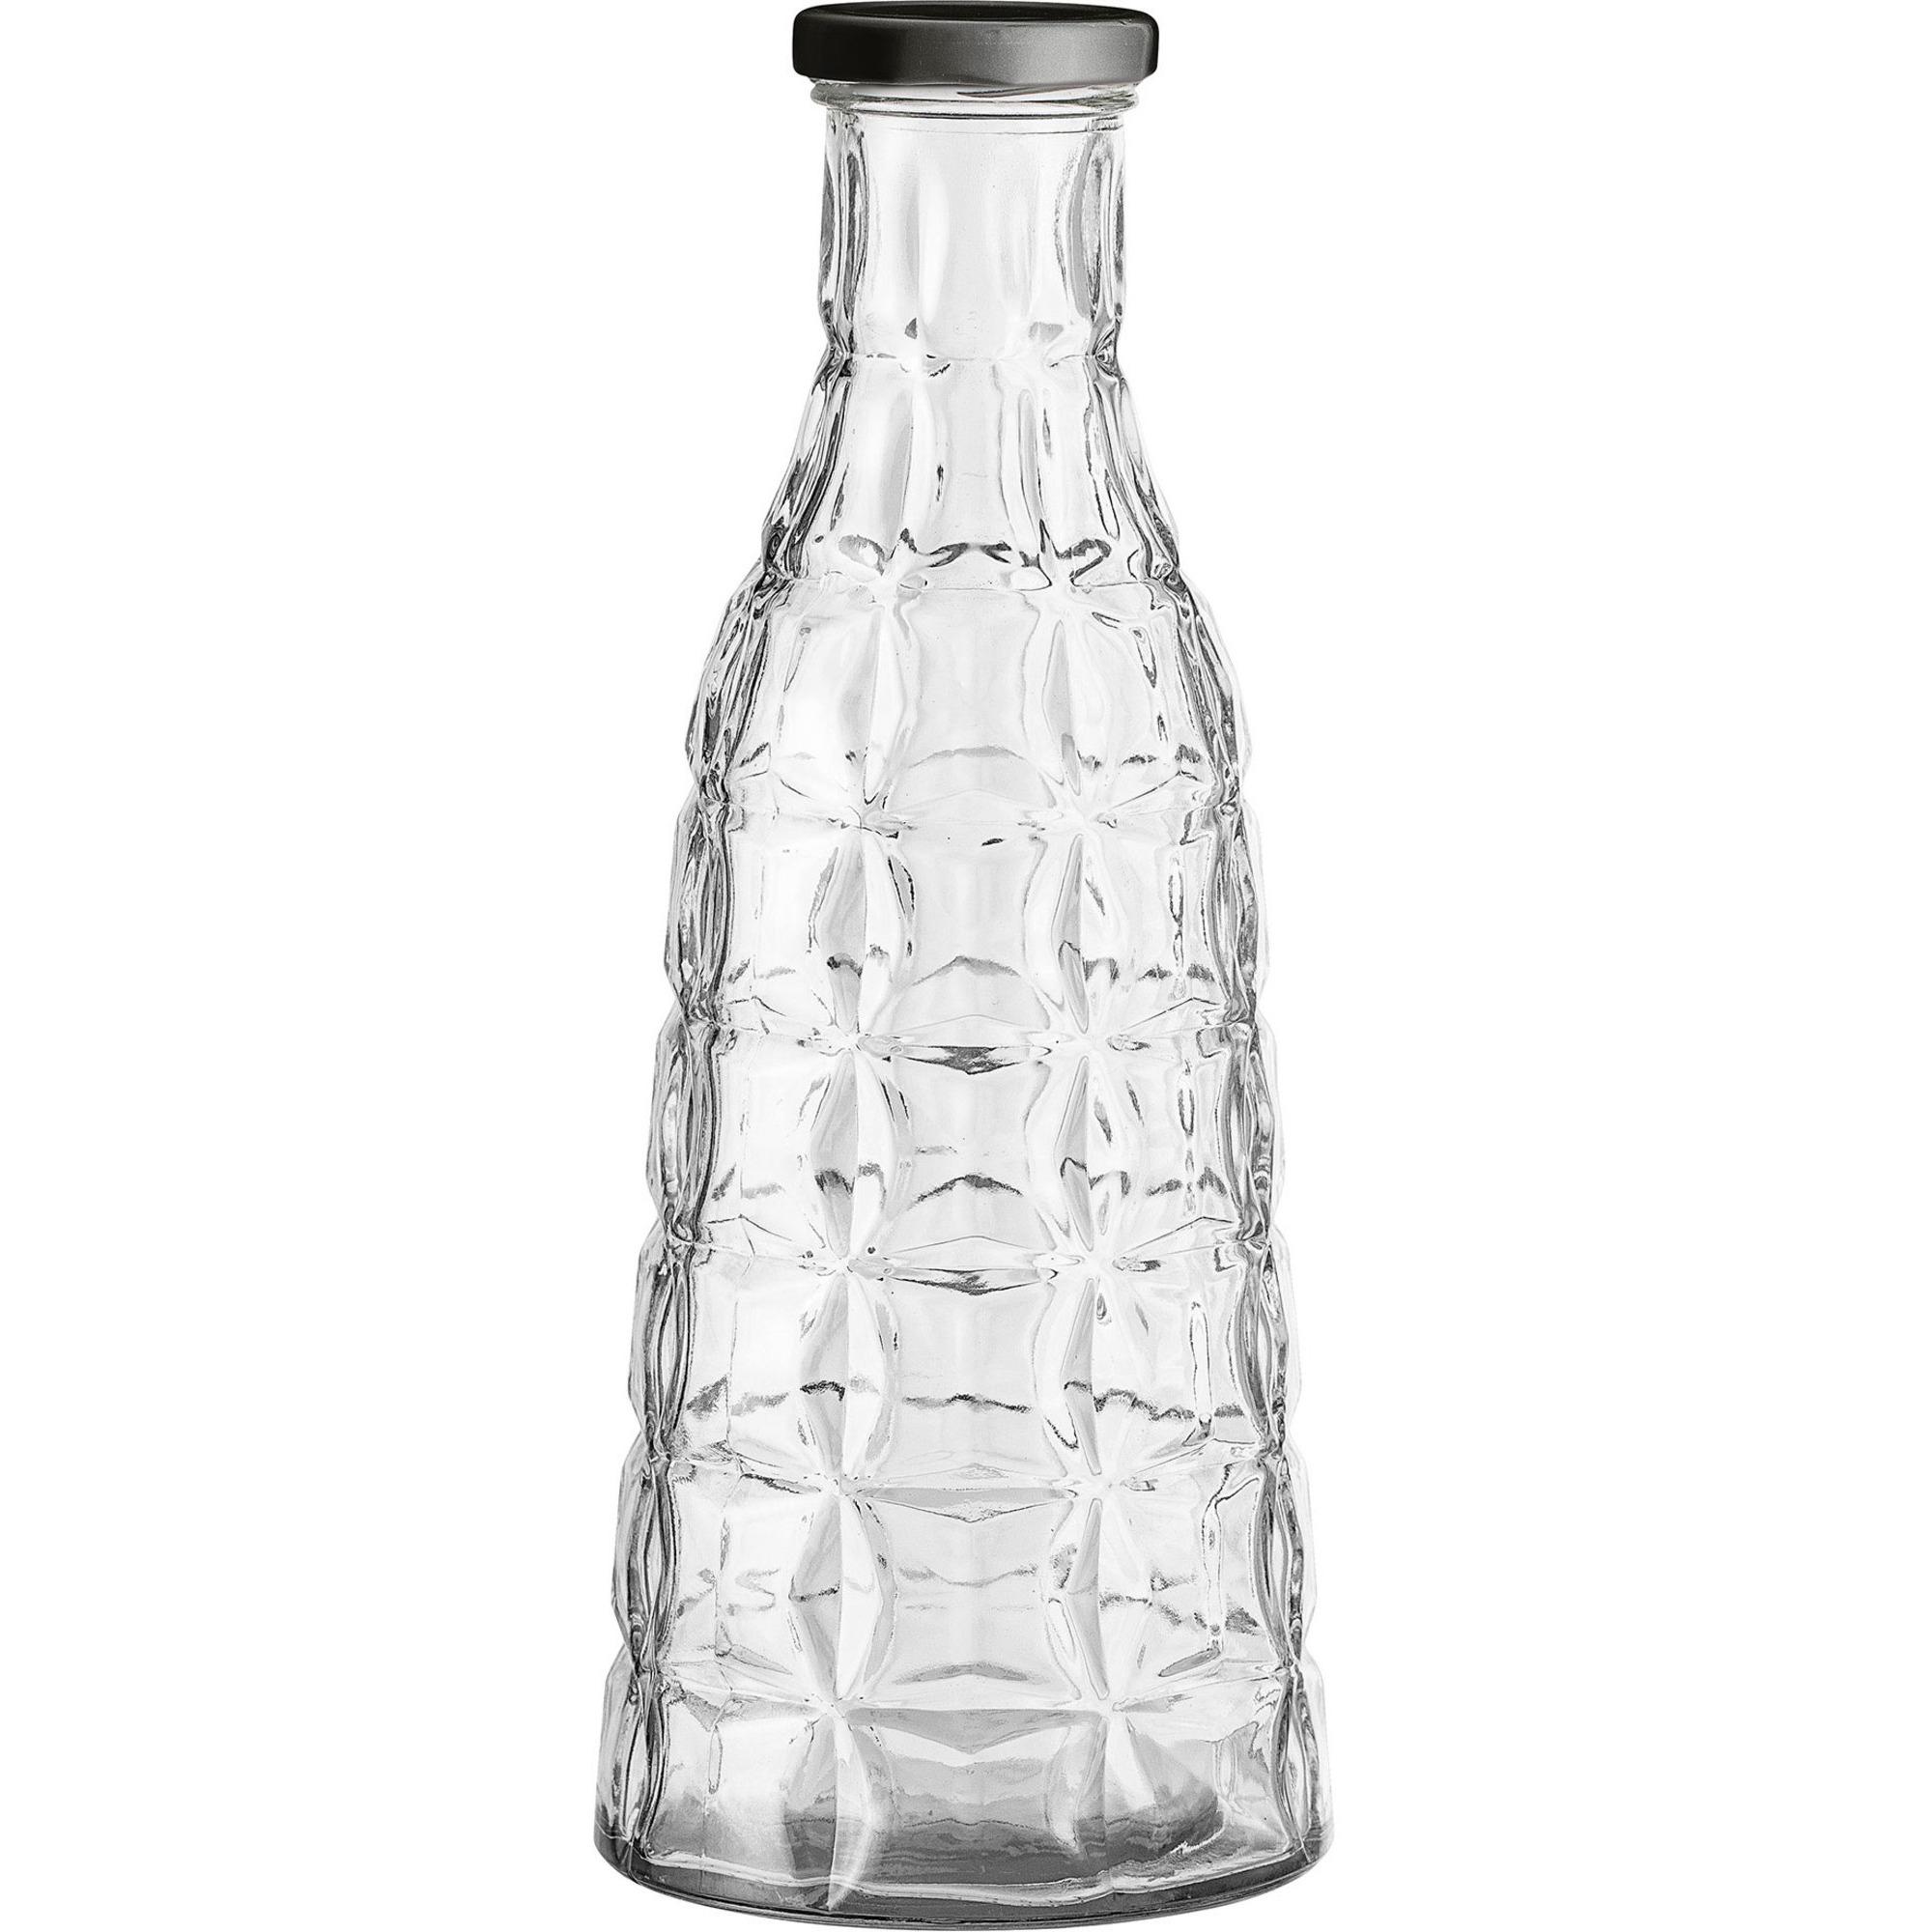 Bloomingville Glasflaska Ø105 cm. m. lock